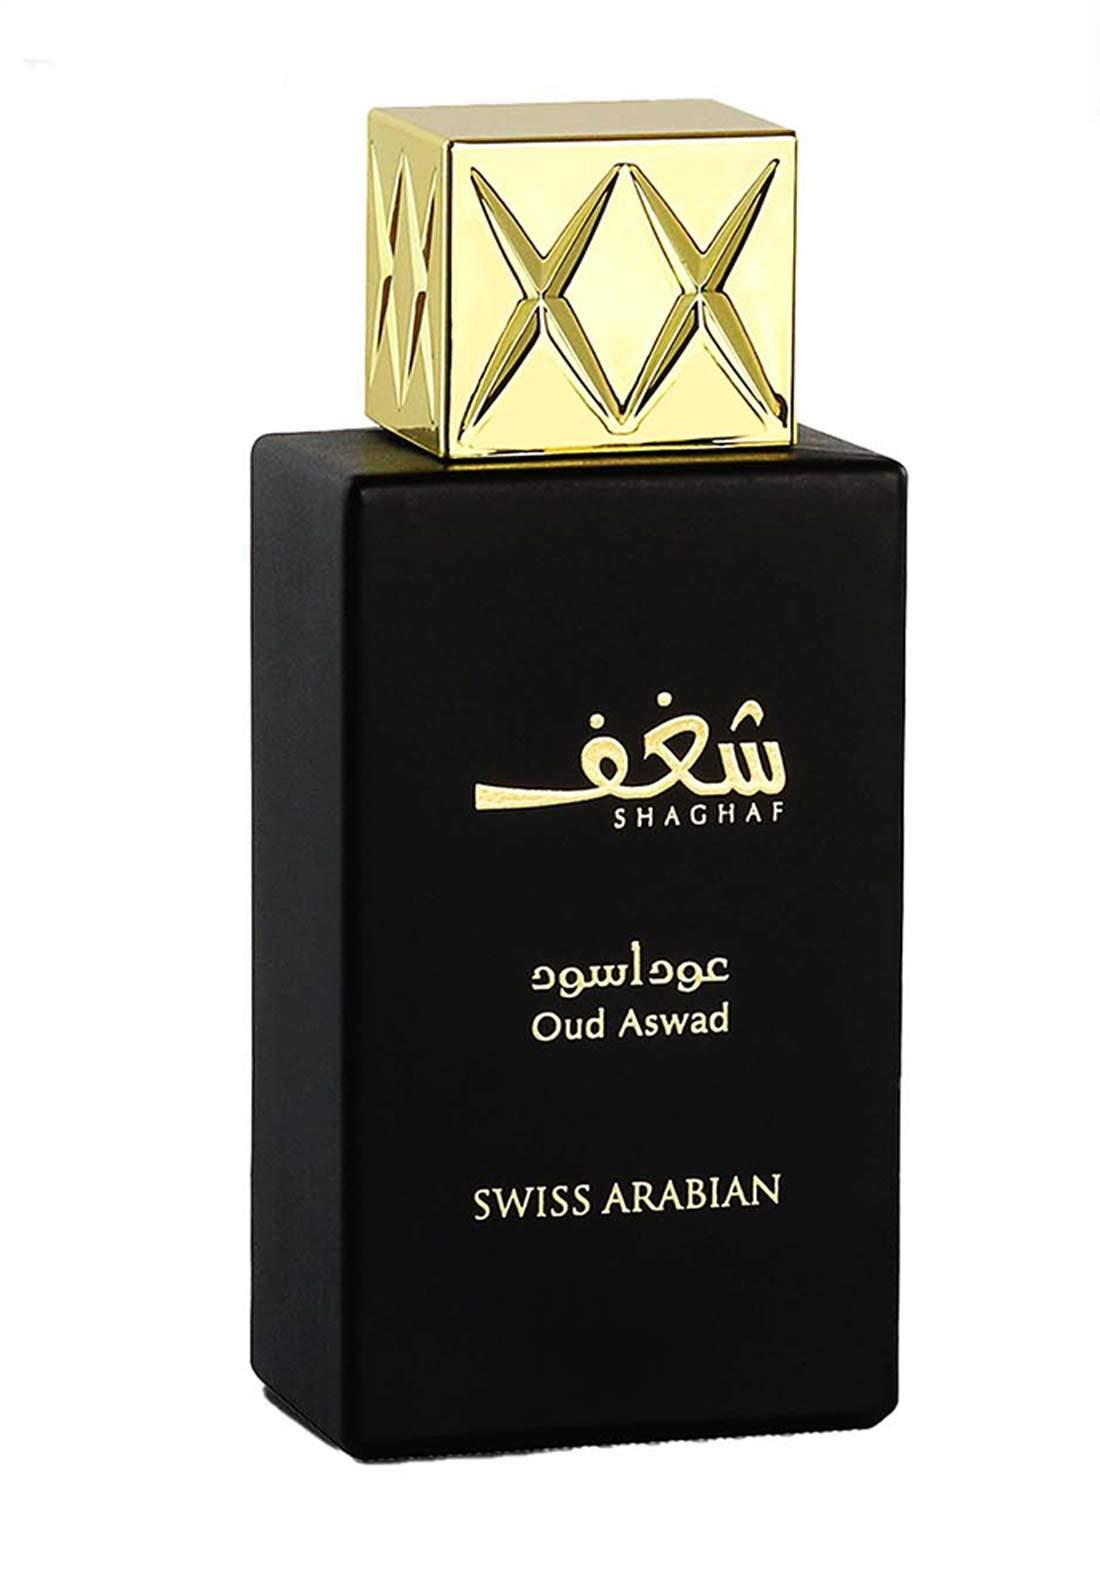 Swiss Arabian 985 Shaghaf Oud Aswad  Unisex Eau De Parfum  -75 ml عطر  لكلا الجنسين